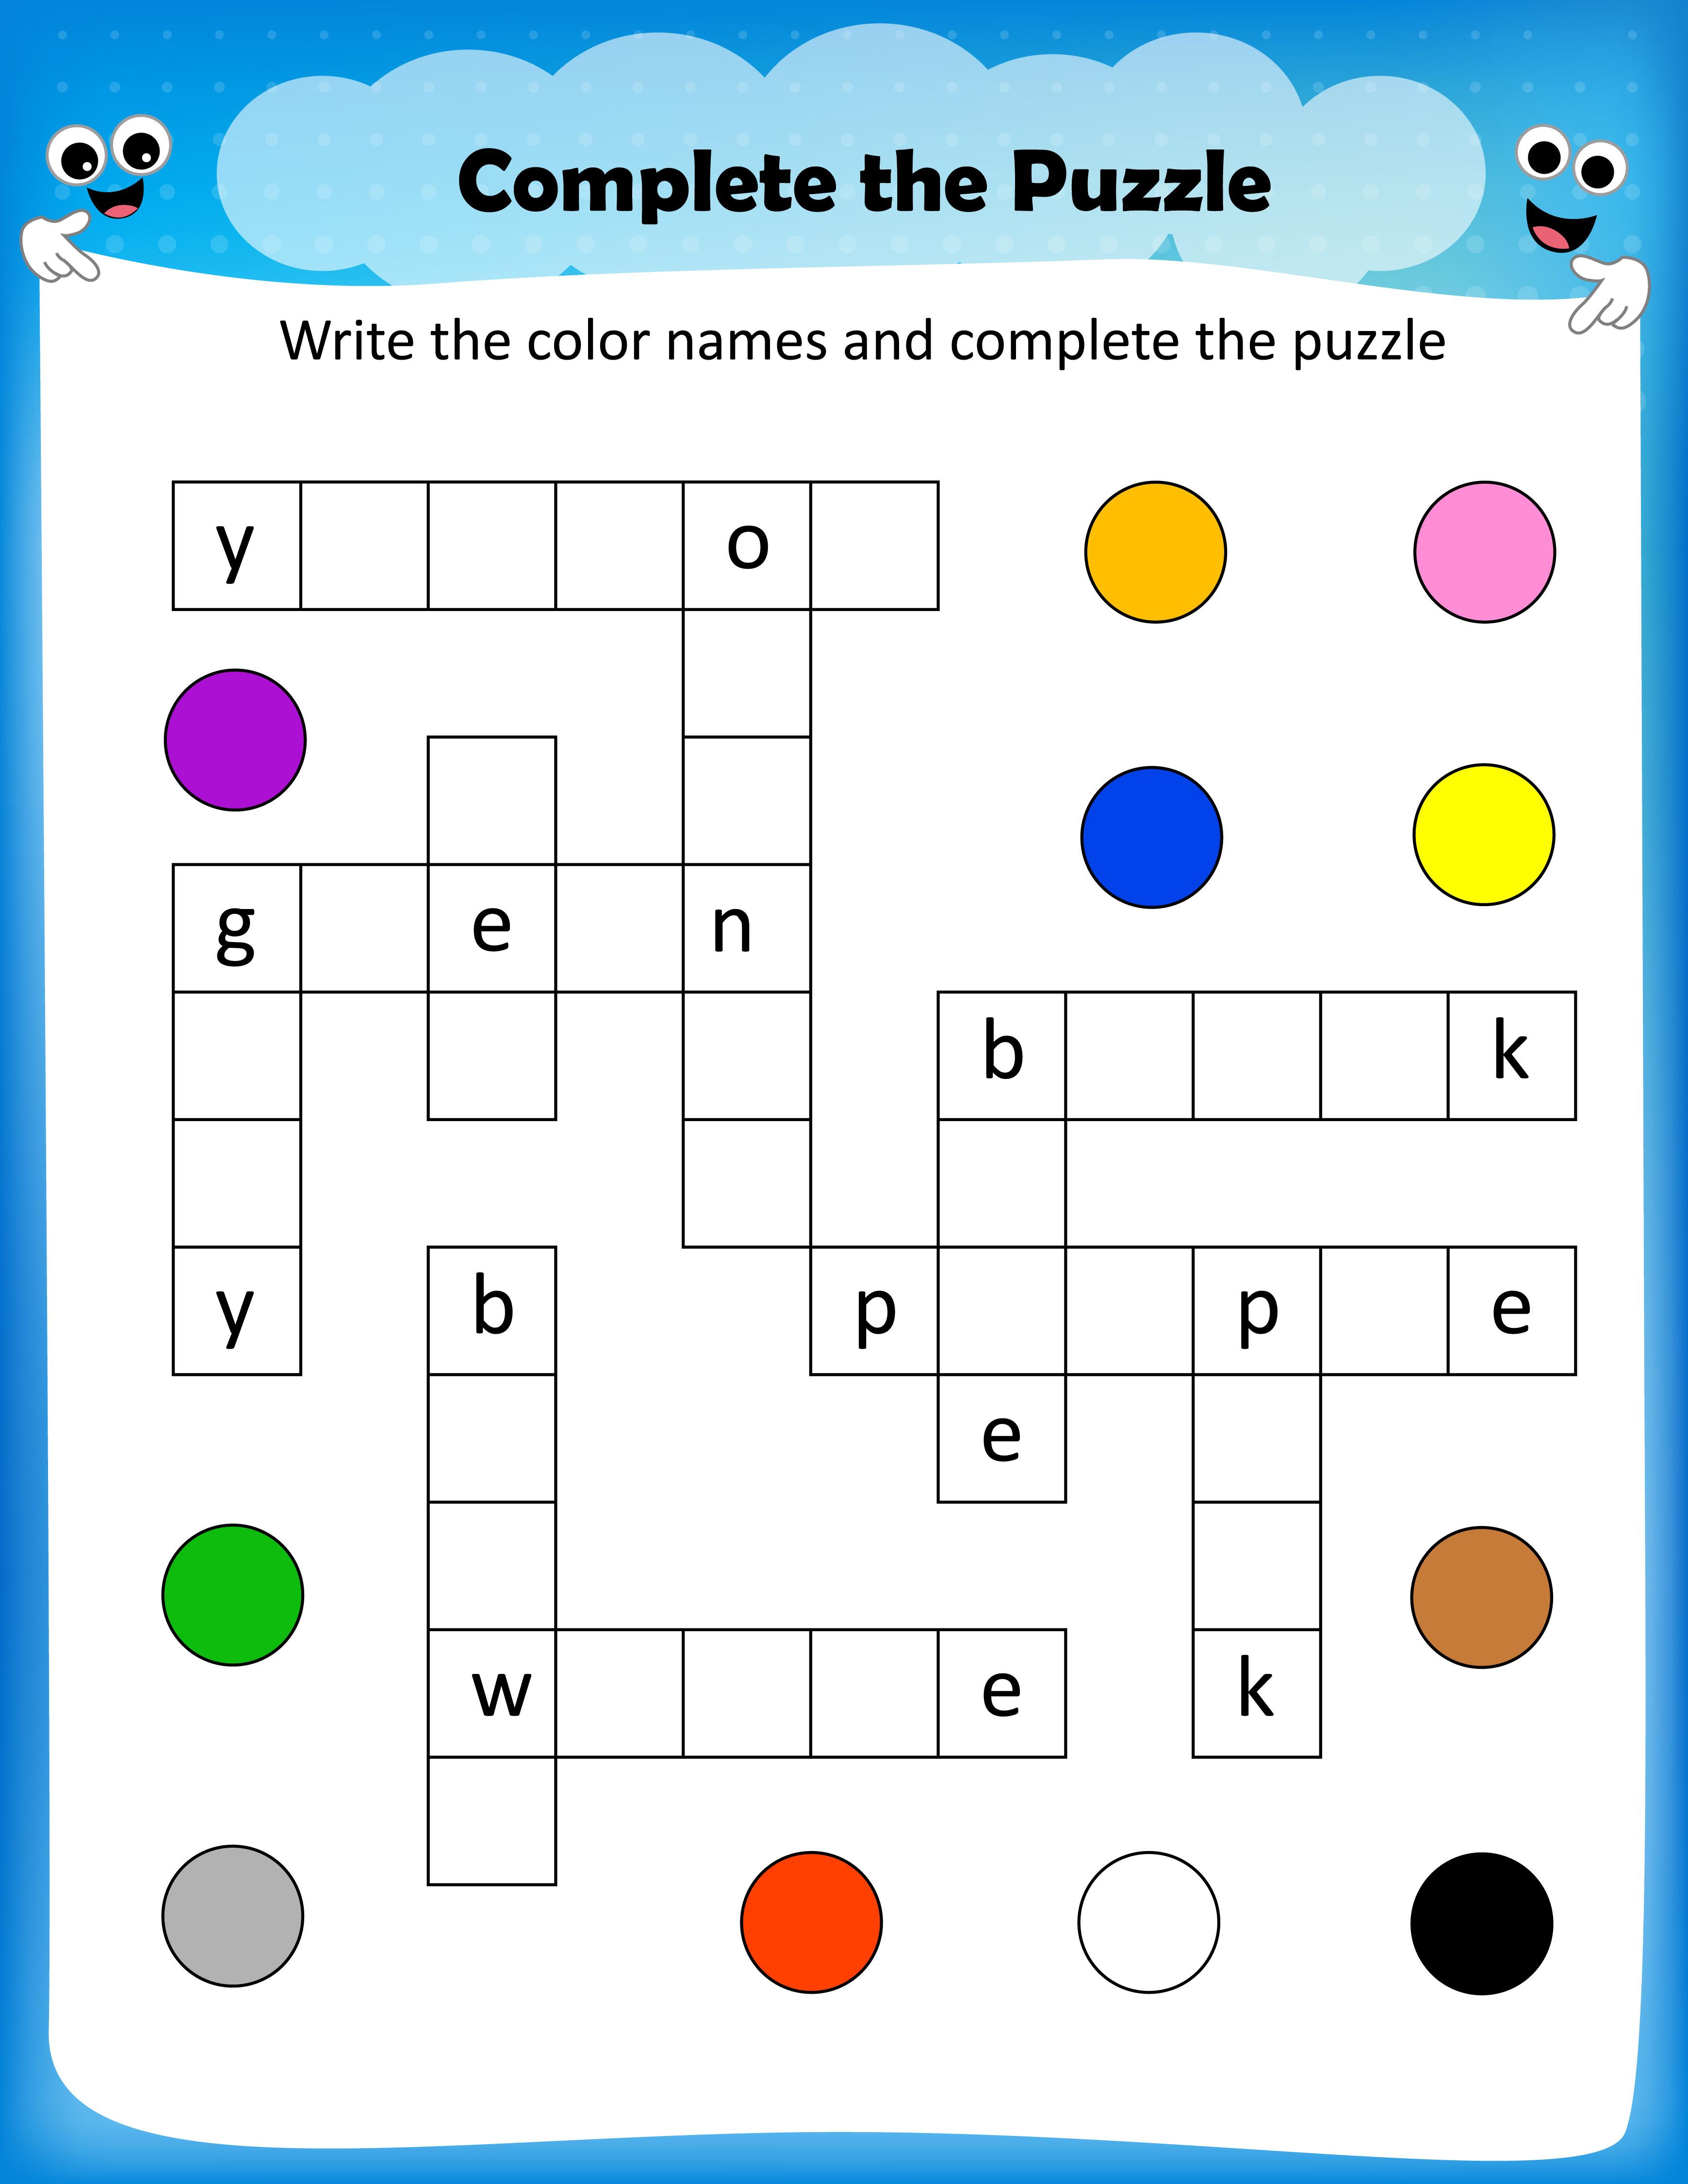 Free Printable Crosswords With Top 10 Benefits For Our Kids - Free Printable Puzzles For Kids